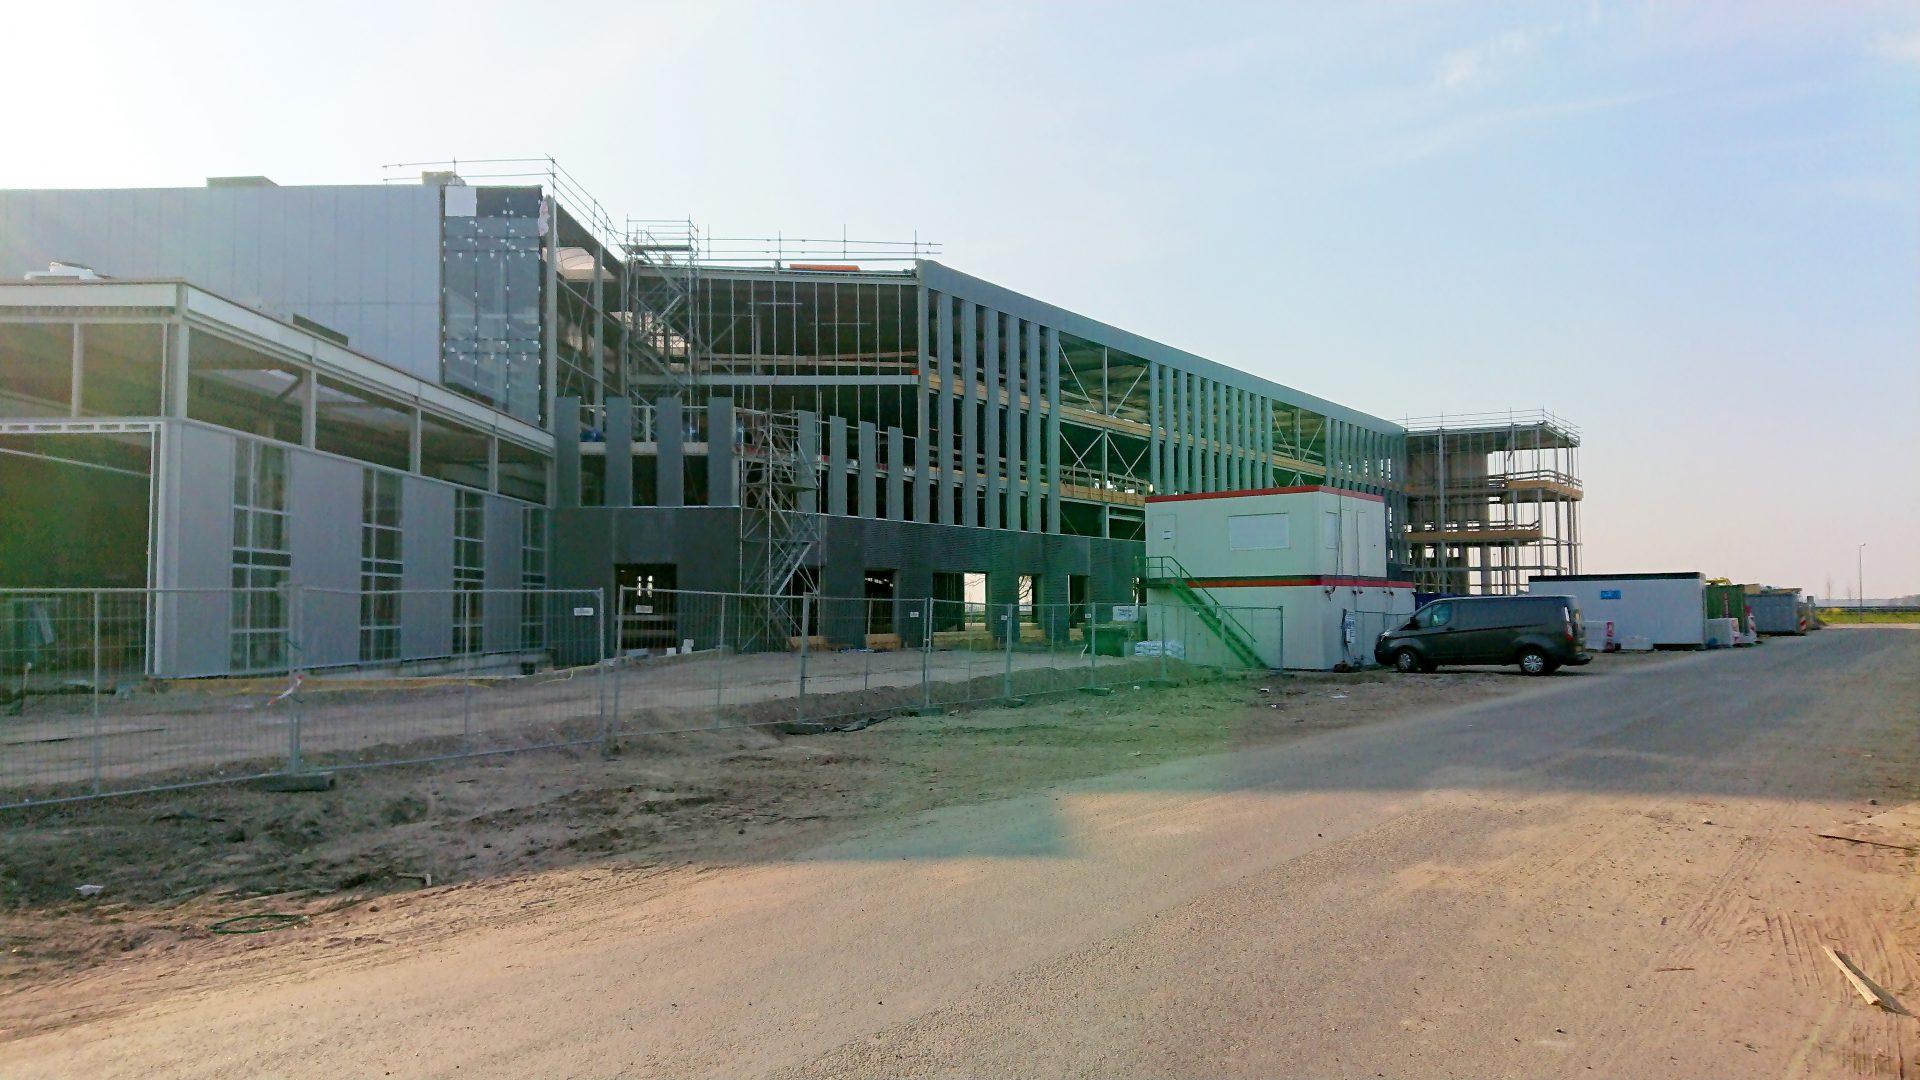 Nieuwbouw bedrijfspand Tacx, Oegstgeest